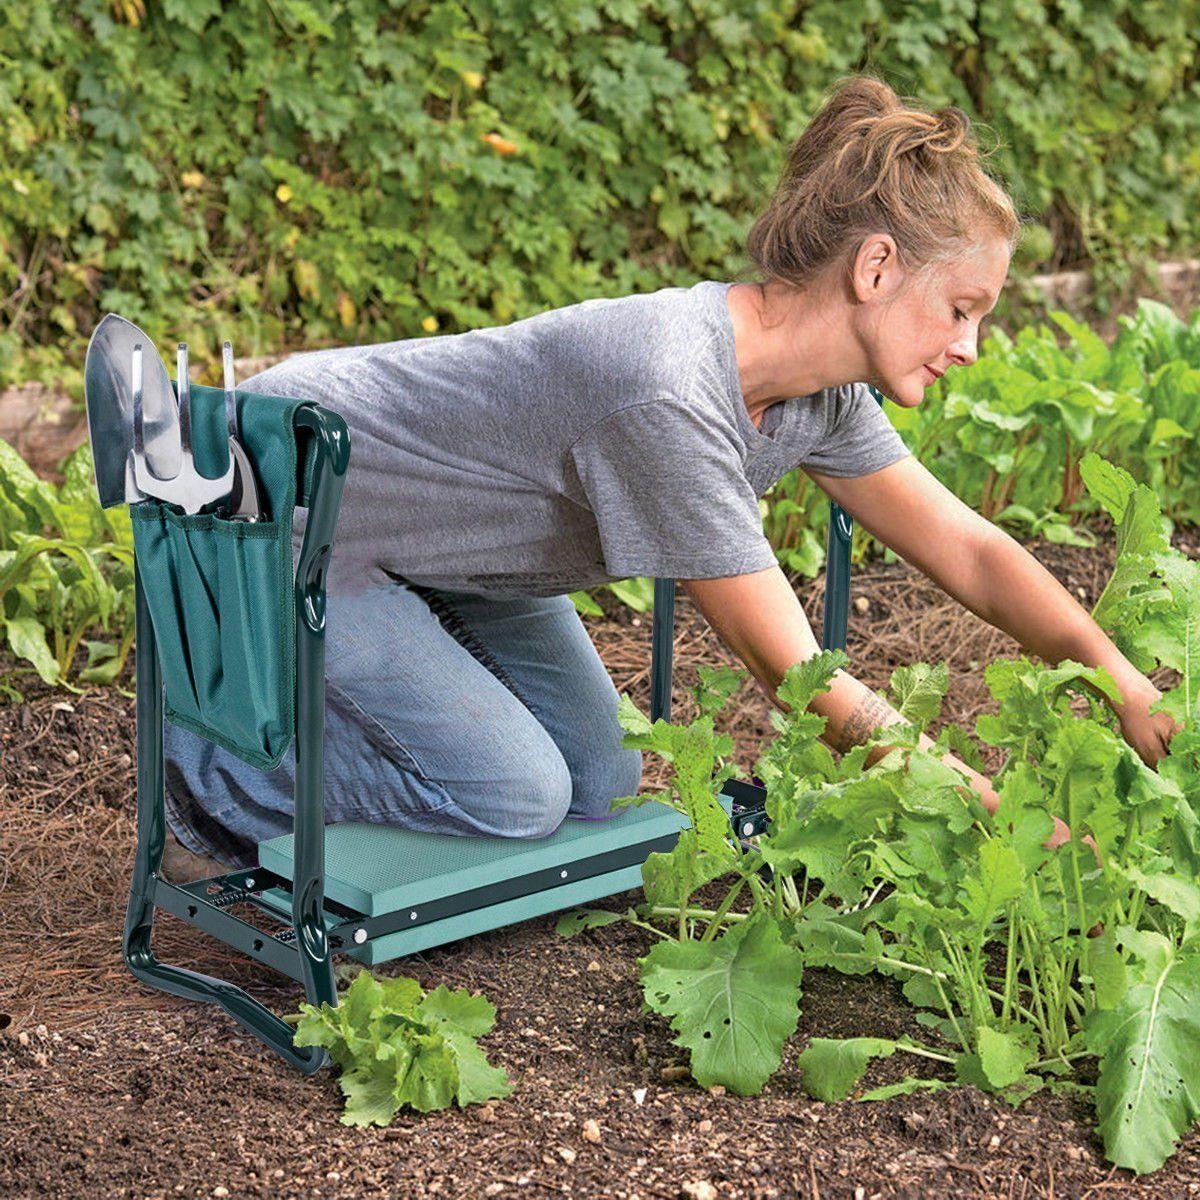 Folding Sturdy Garden Kneeler Pad Cushion Seat Garden Kneeler Garden Bags Portable Garden